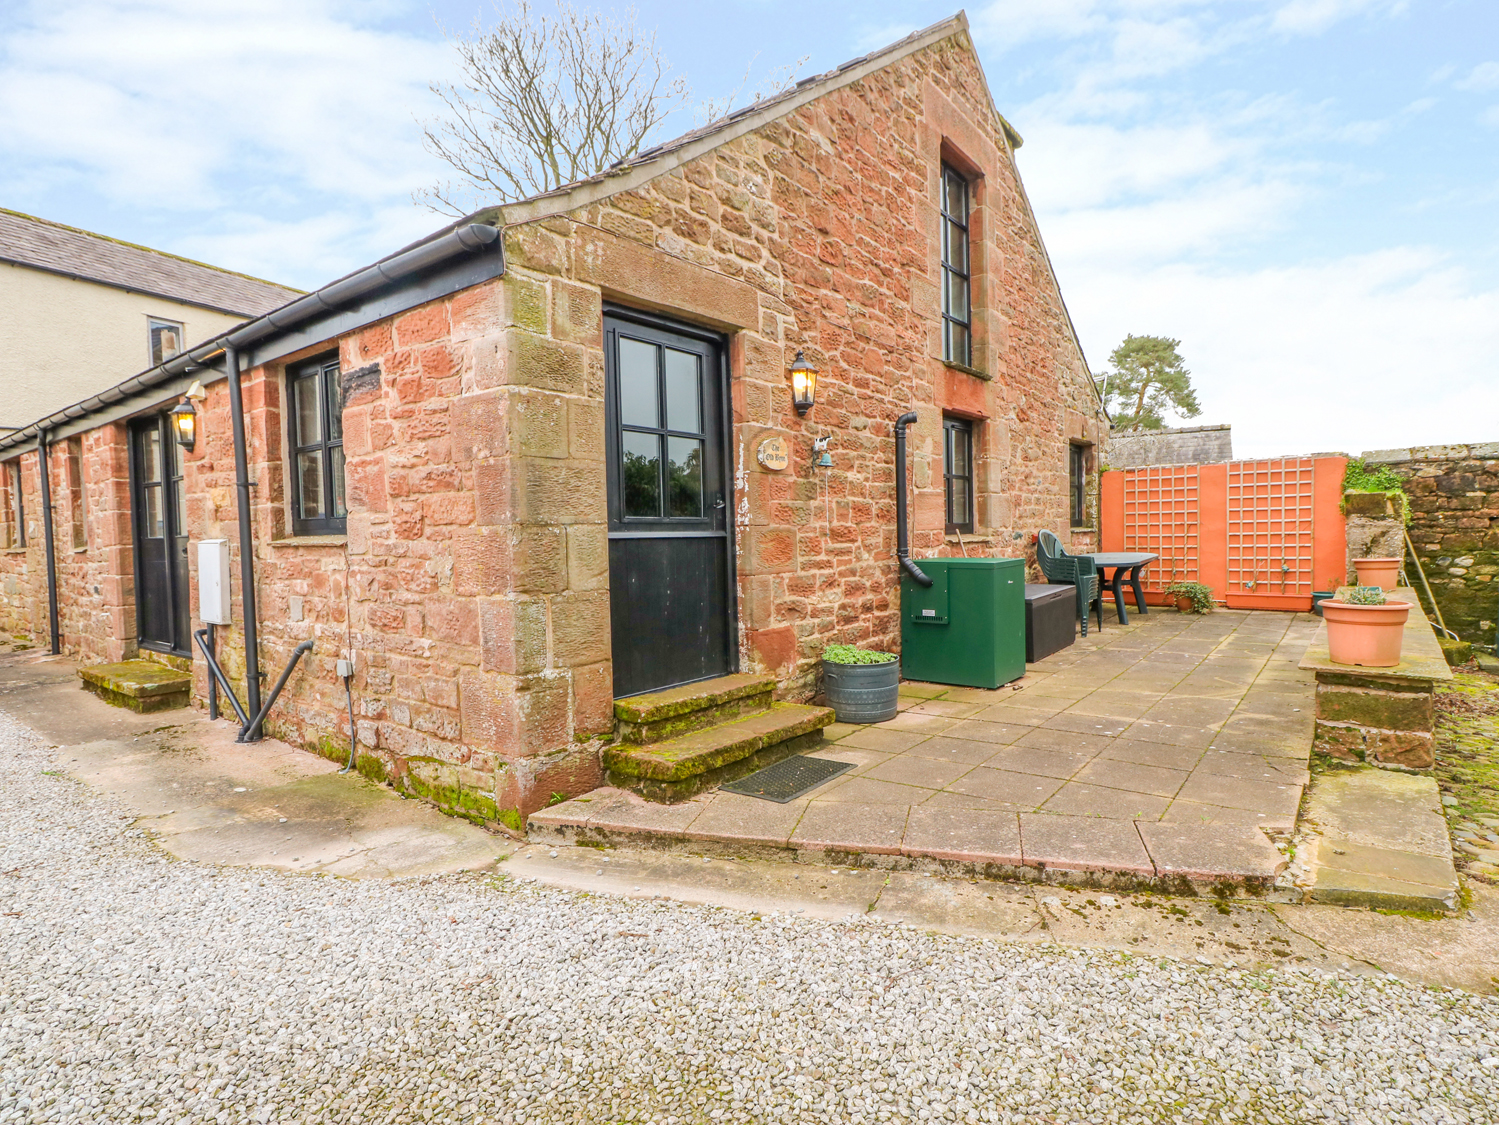 3 bedroom Cottage for rent in Appleby in Westmorland